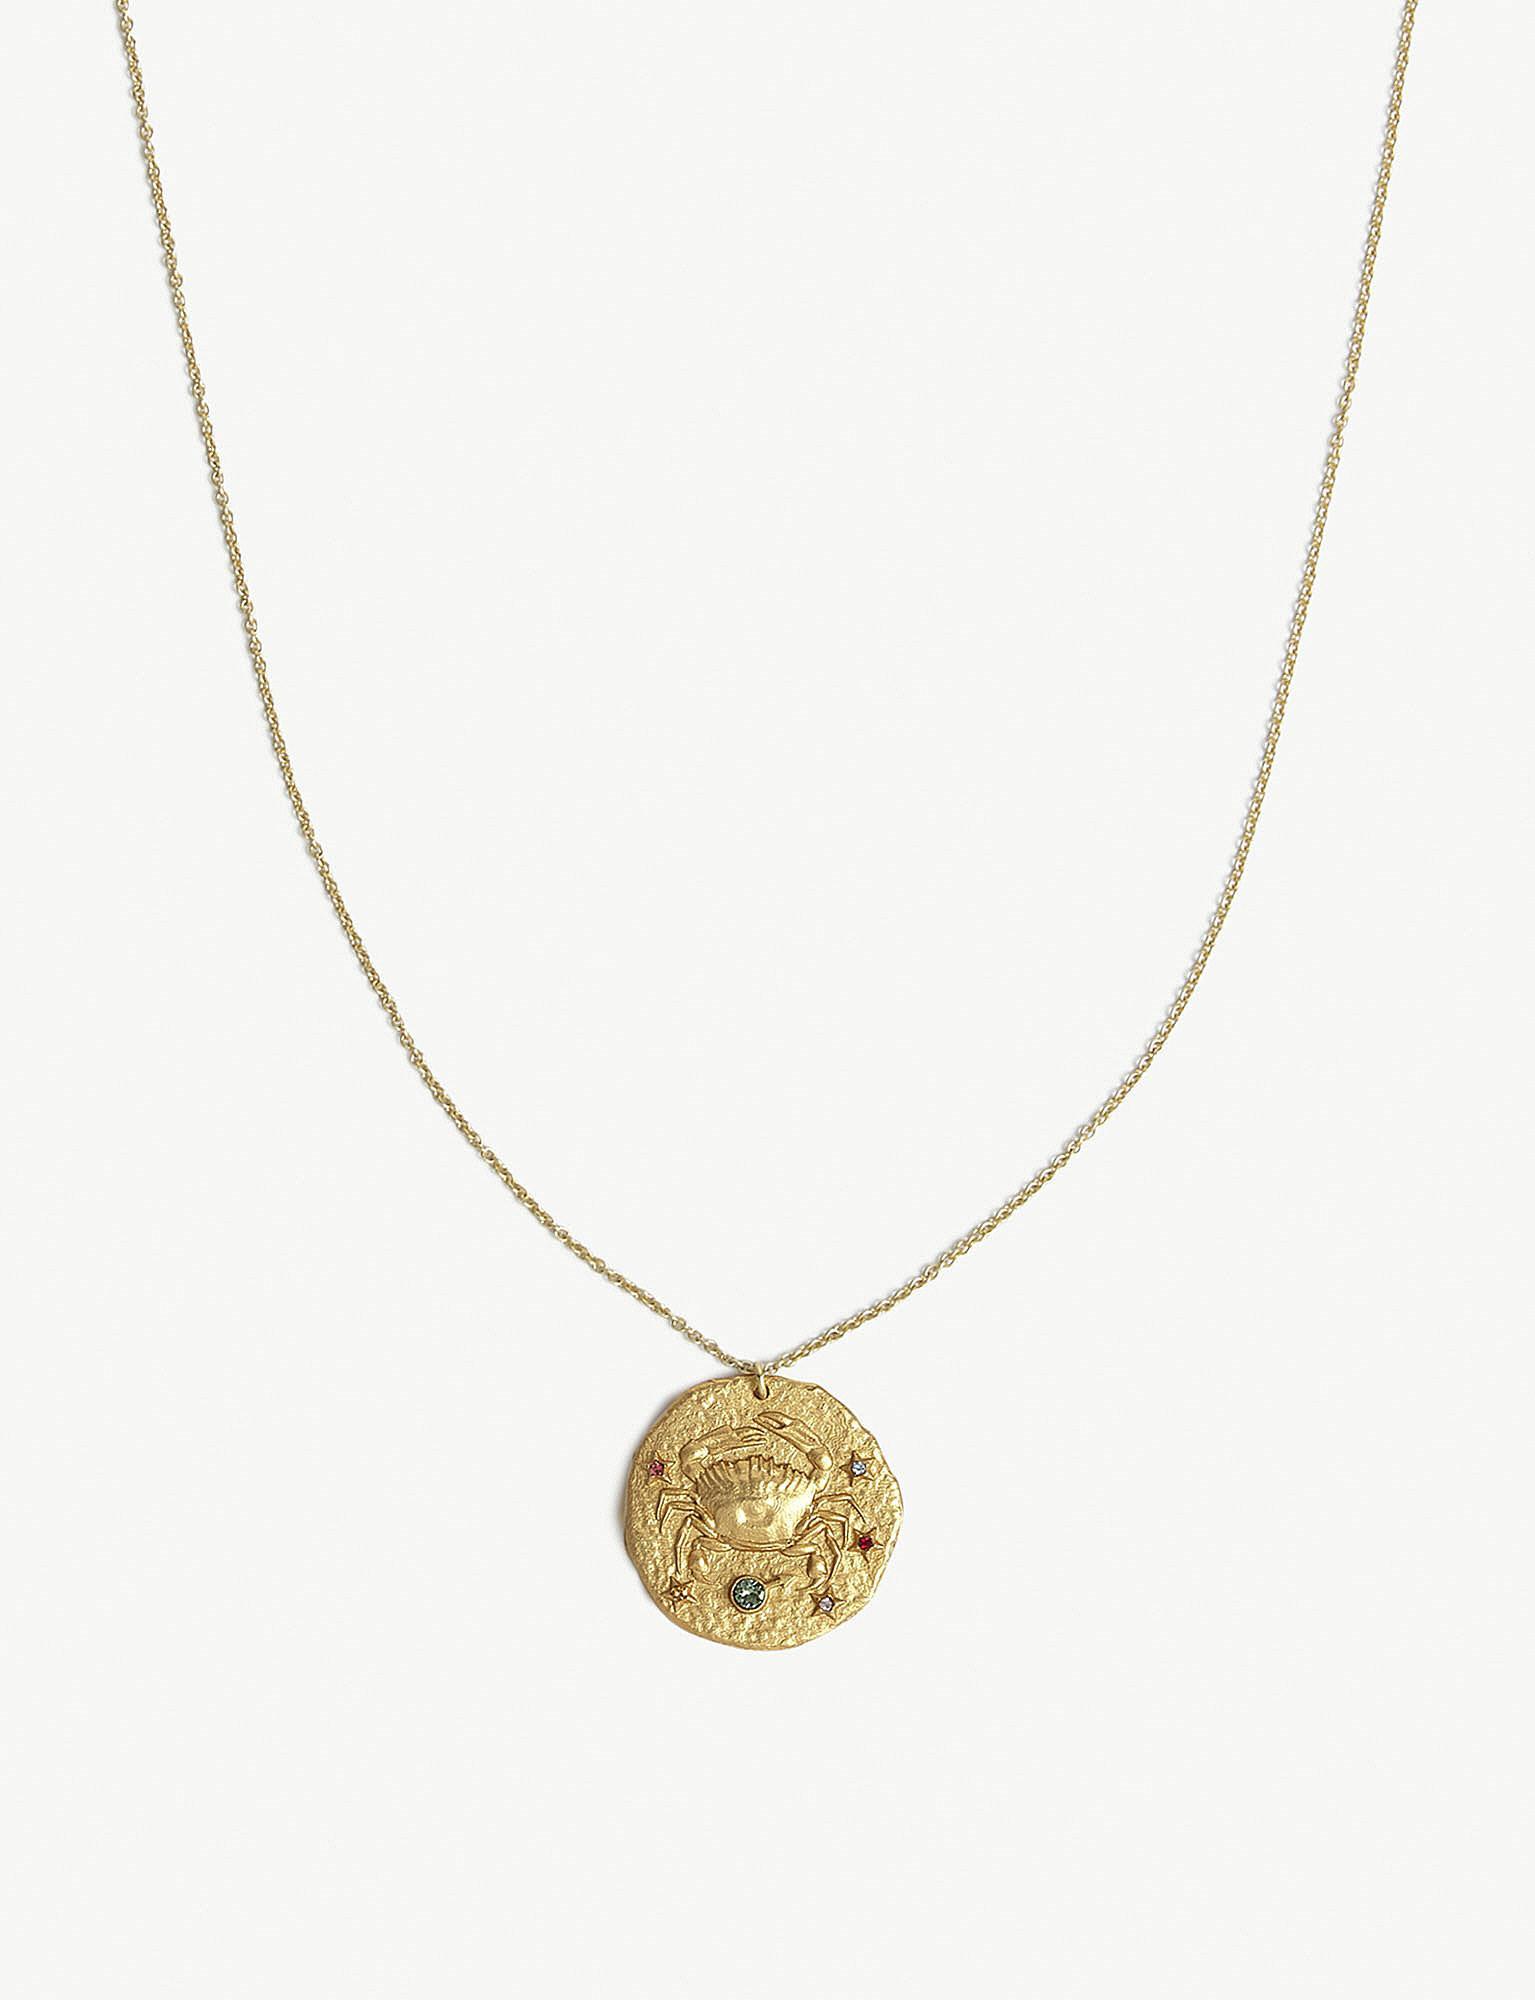 bf54dbe5d6ffdc Maje Cancer Zodiac Brass Coin Necklace in Metallic - Lyst